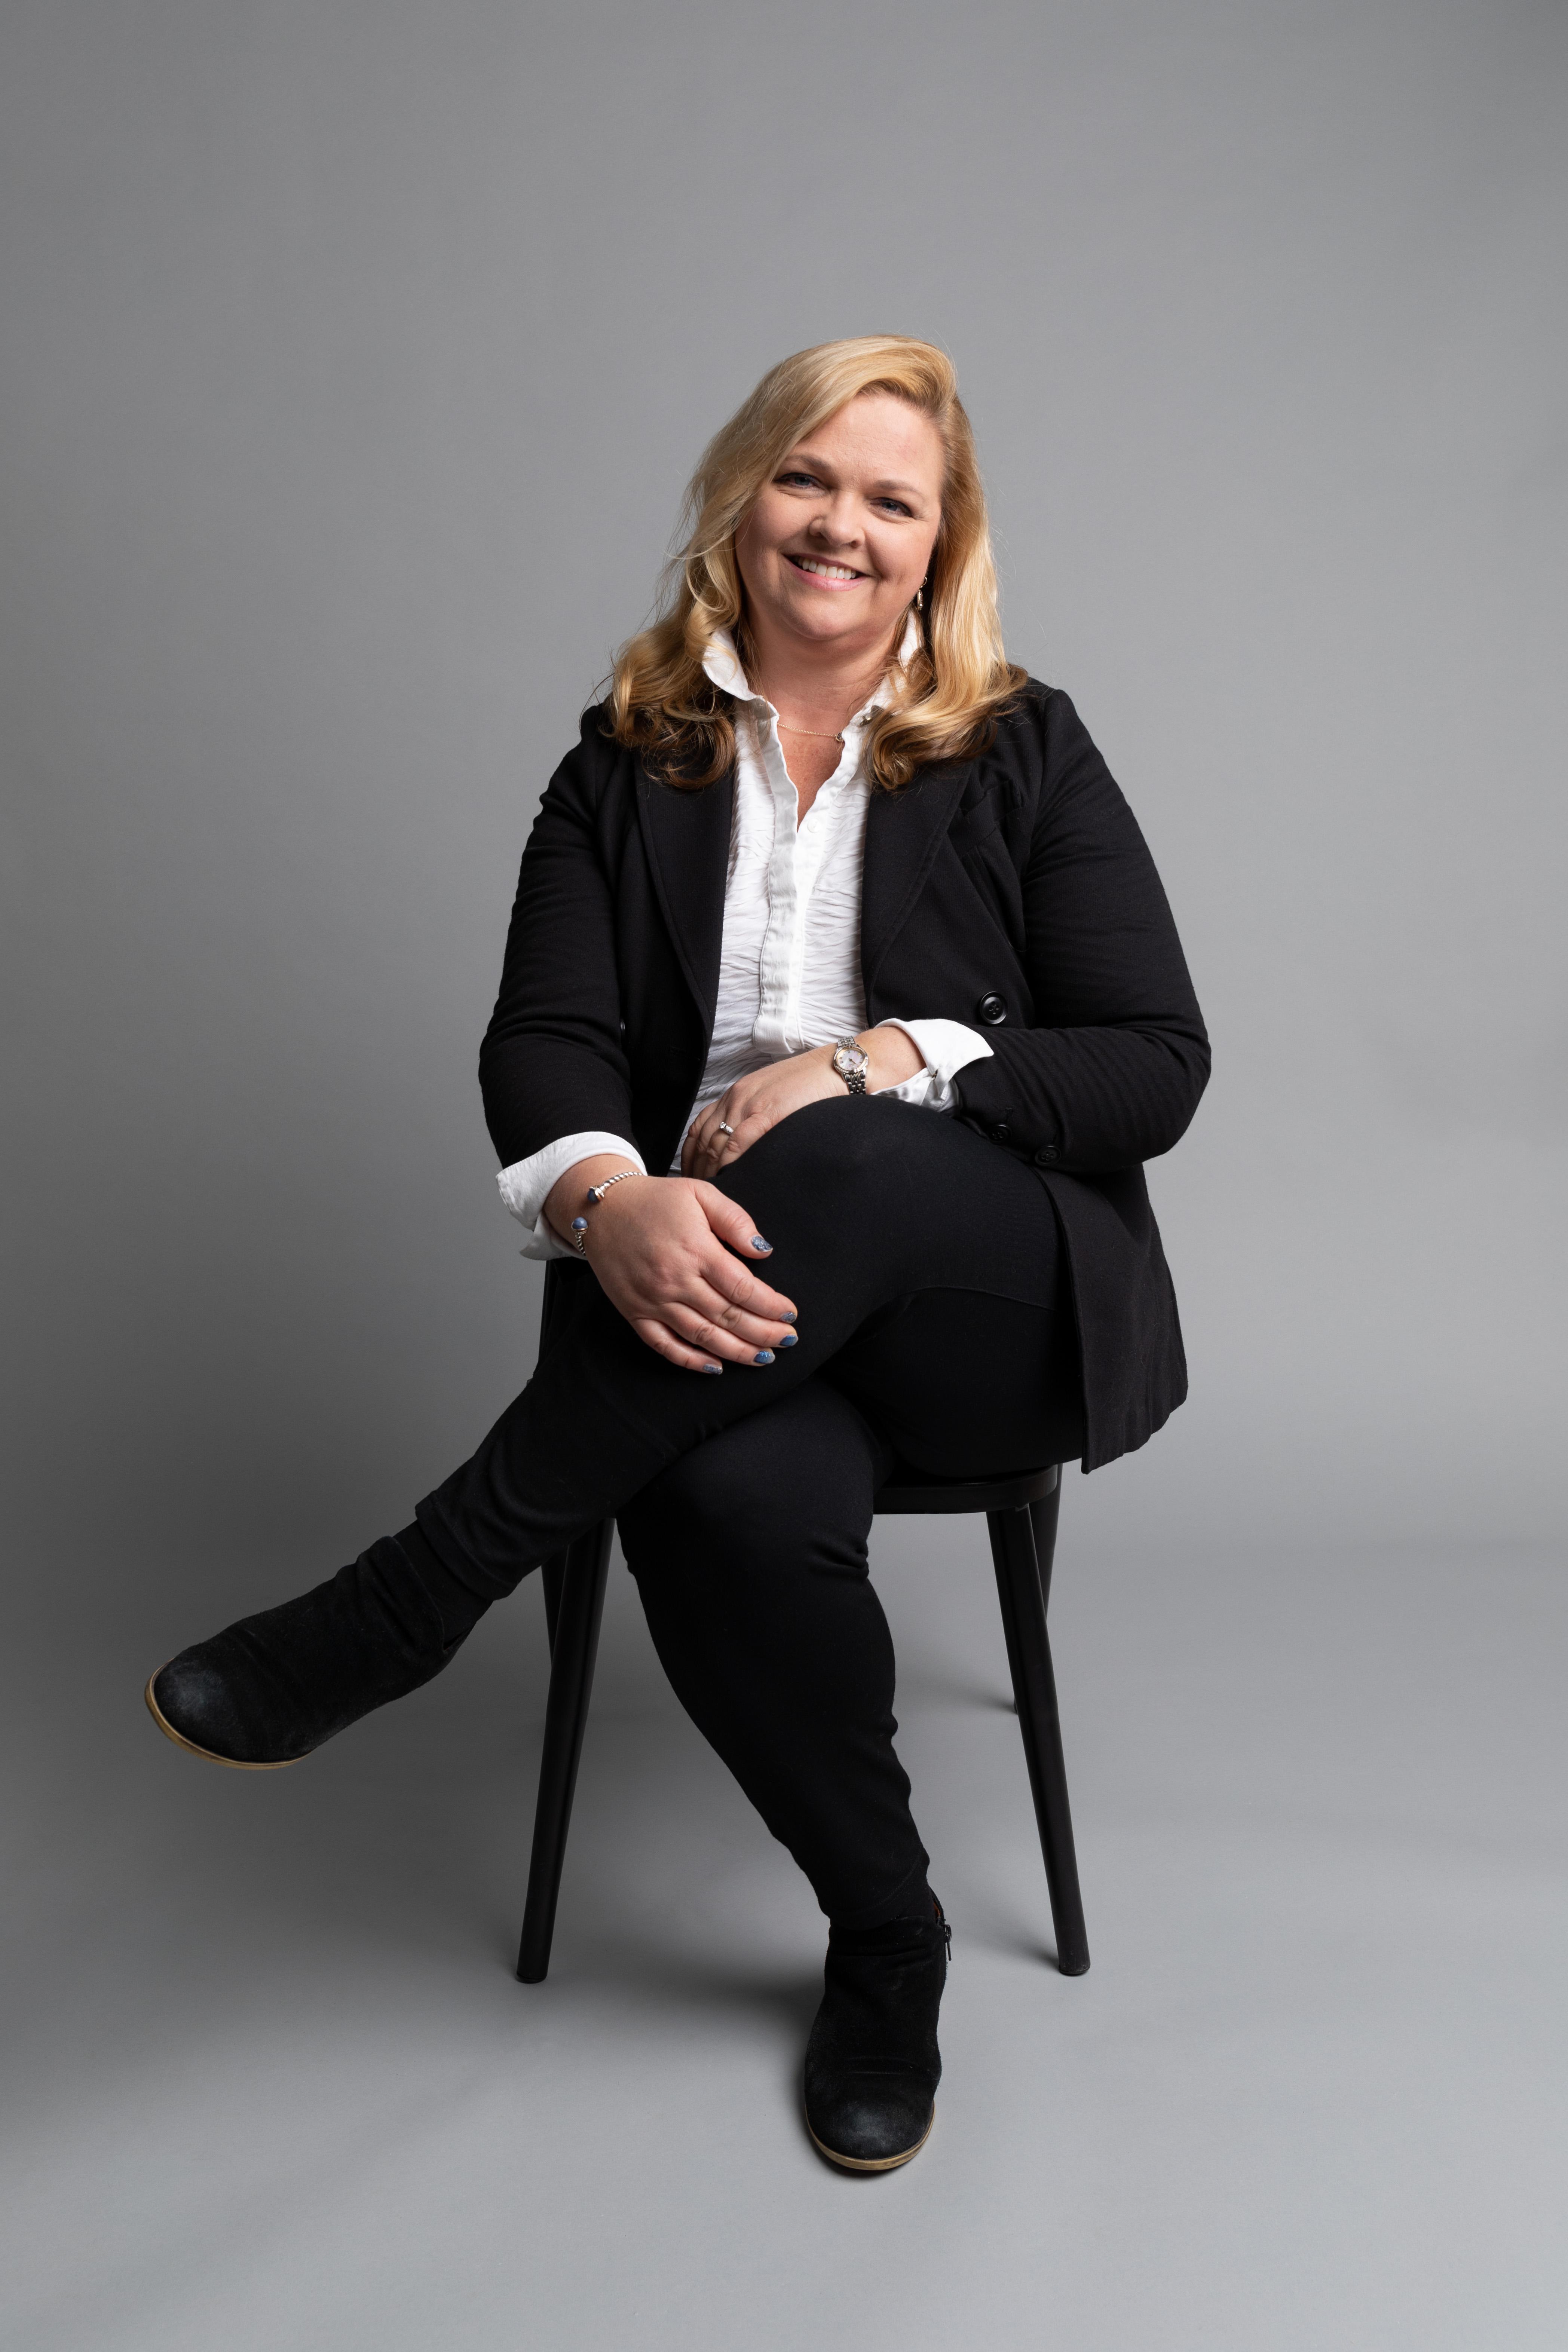 Amy K. Theisen